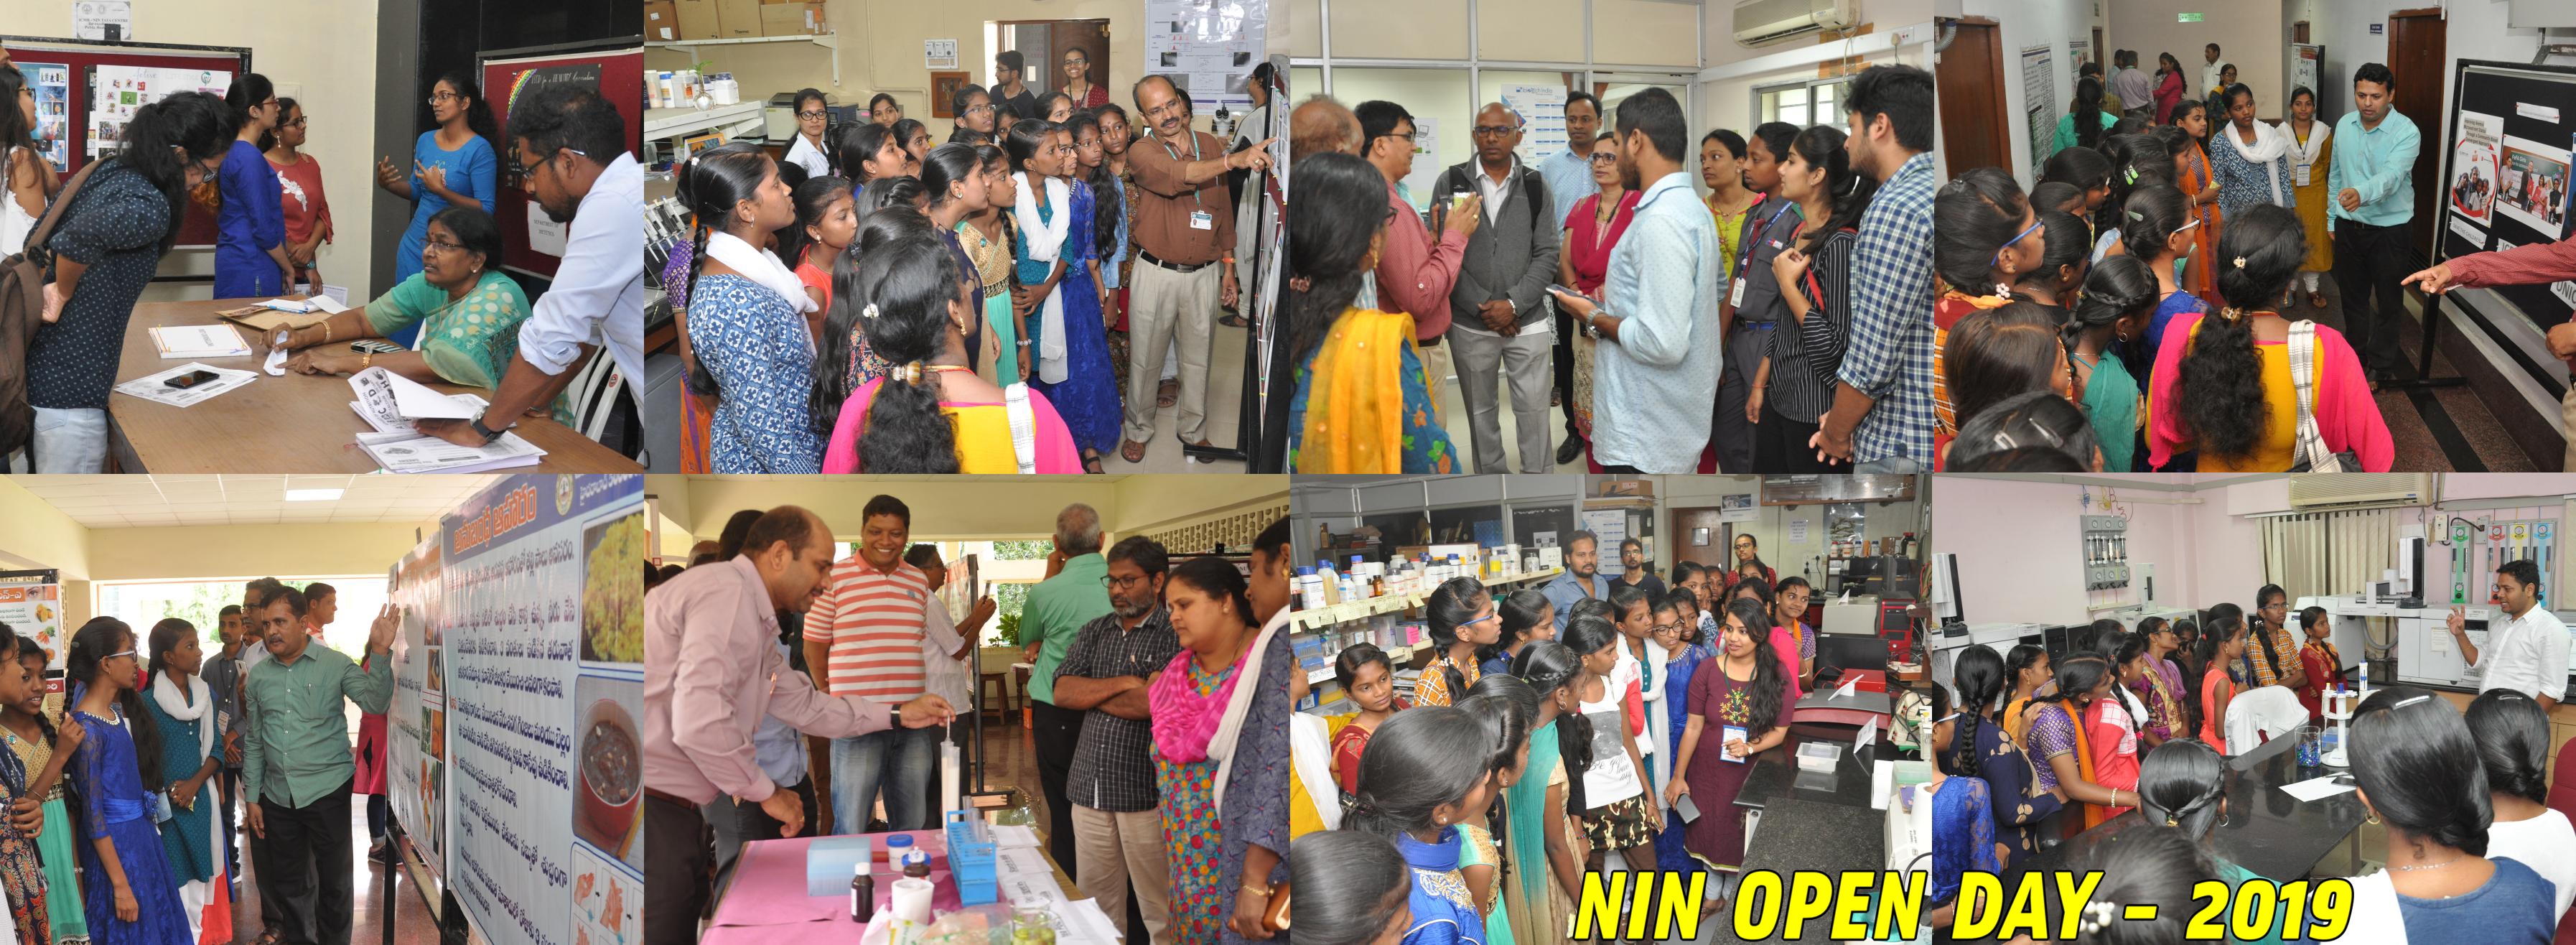 ICMR-National Institute of Nutrition, India